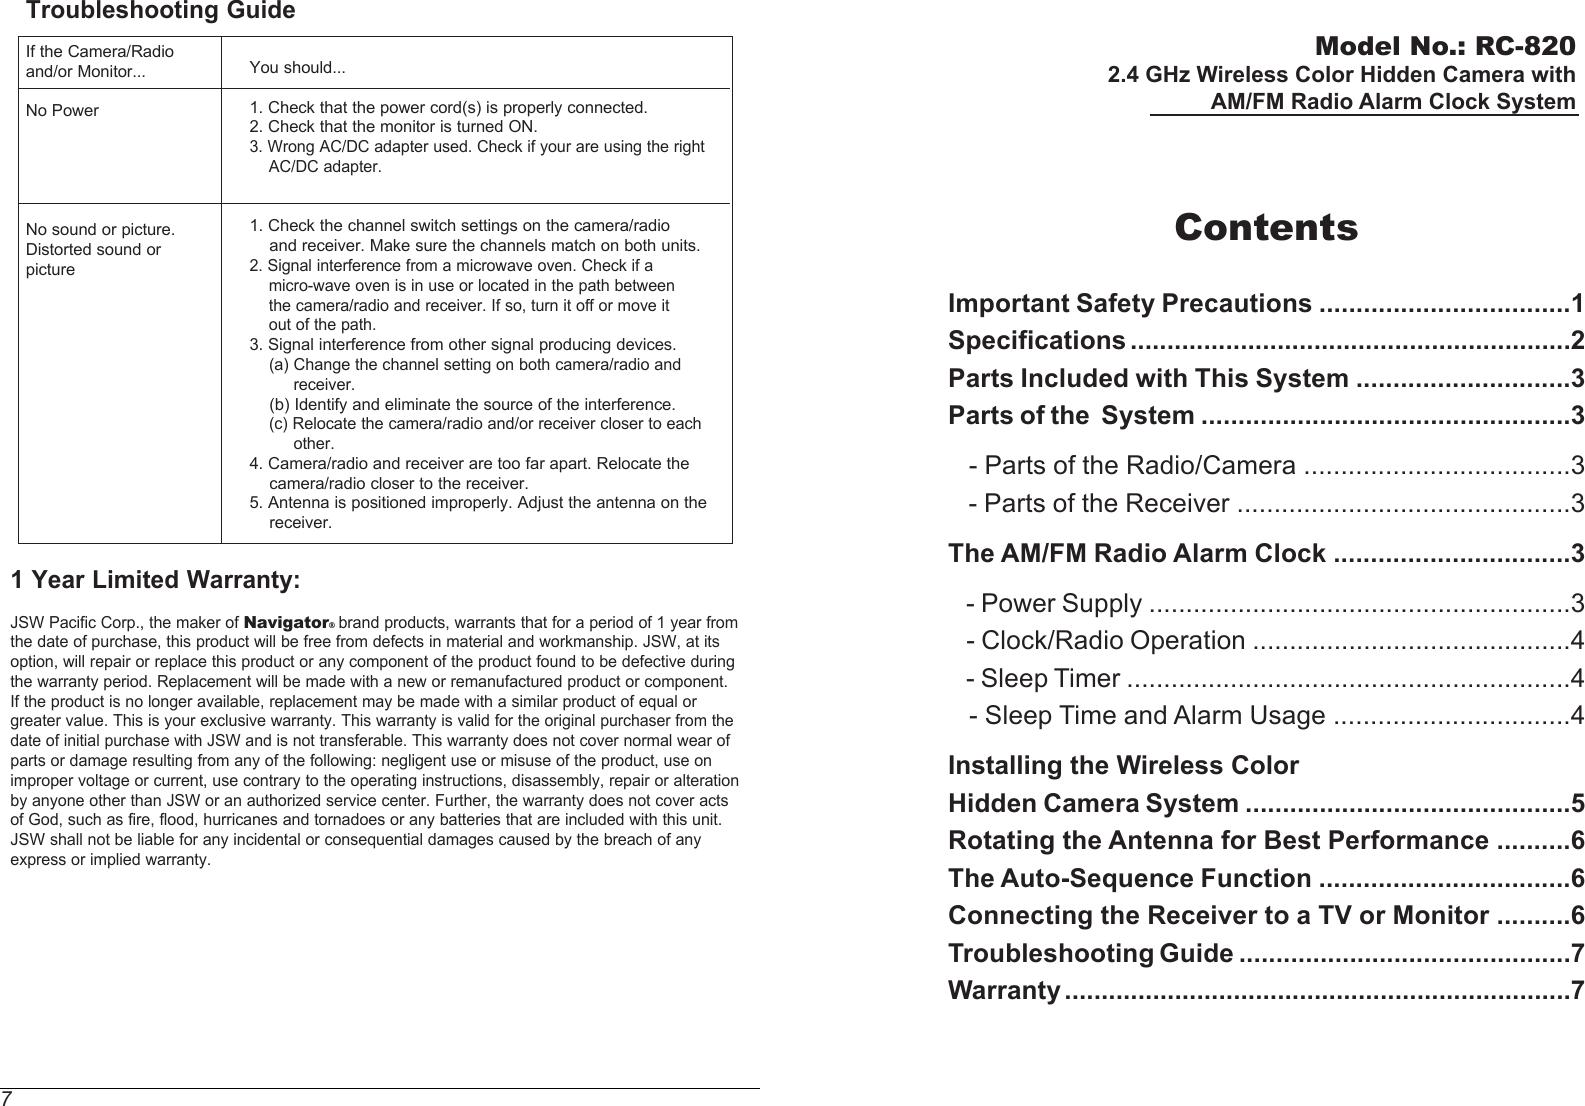 hidden camera manual of instructions